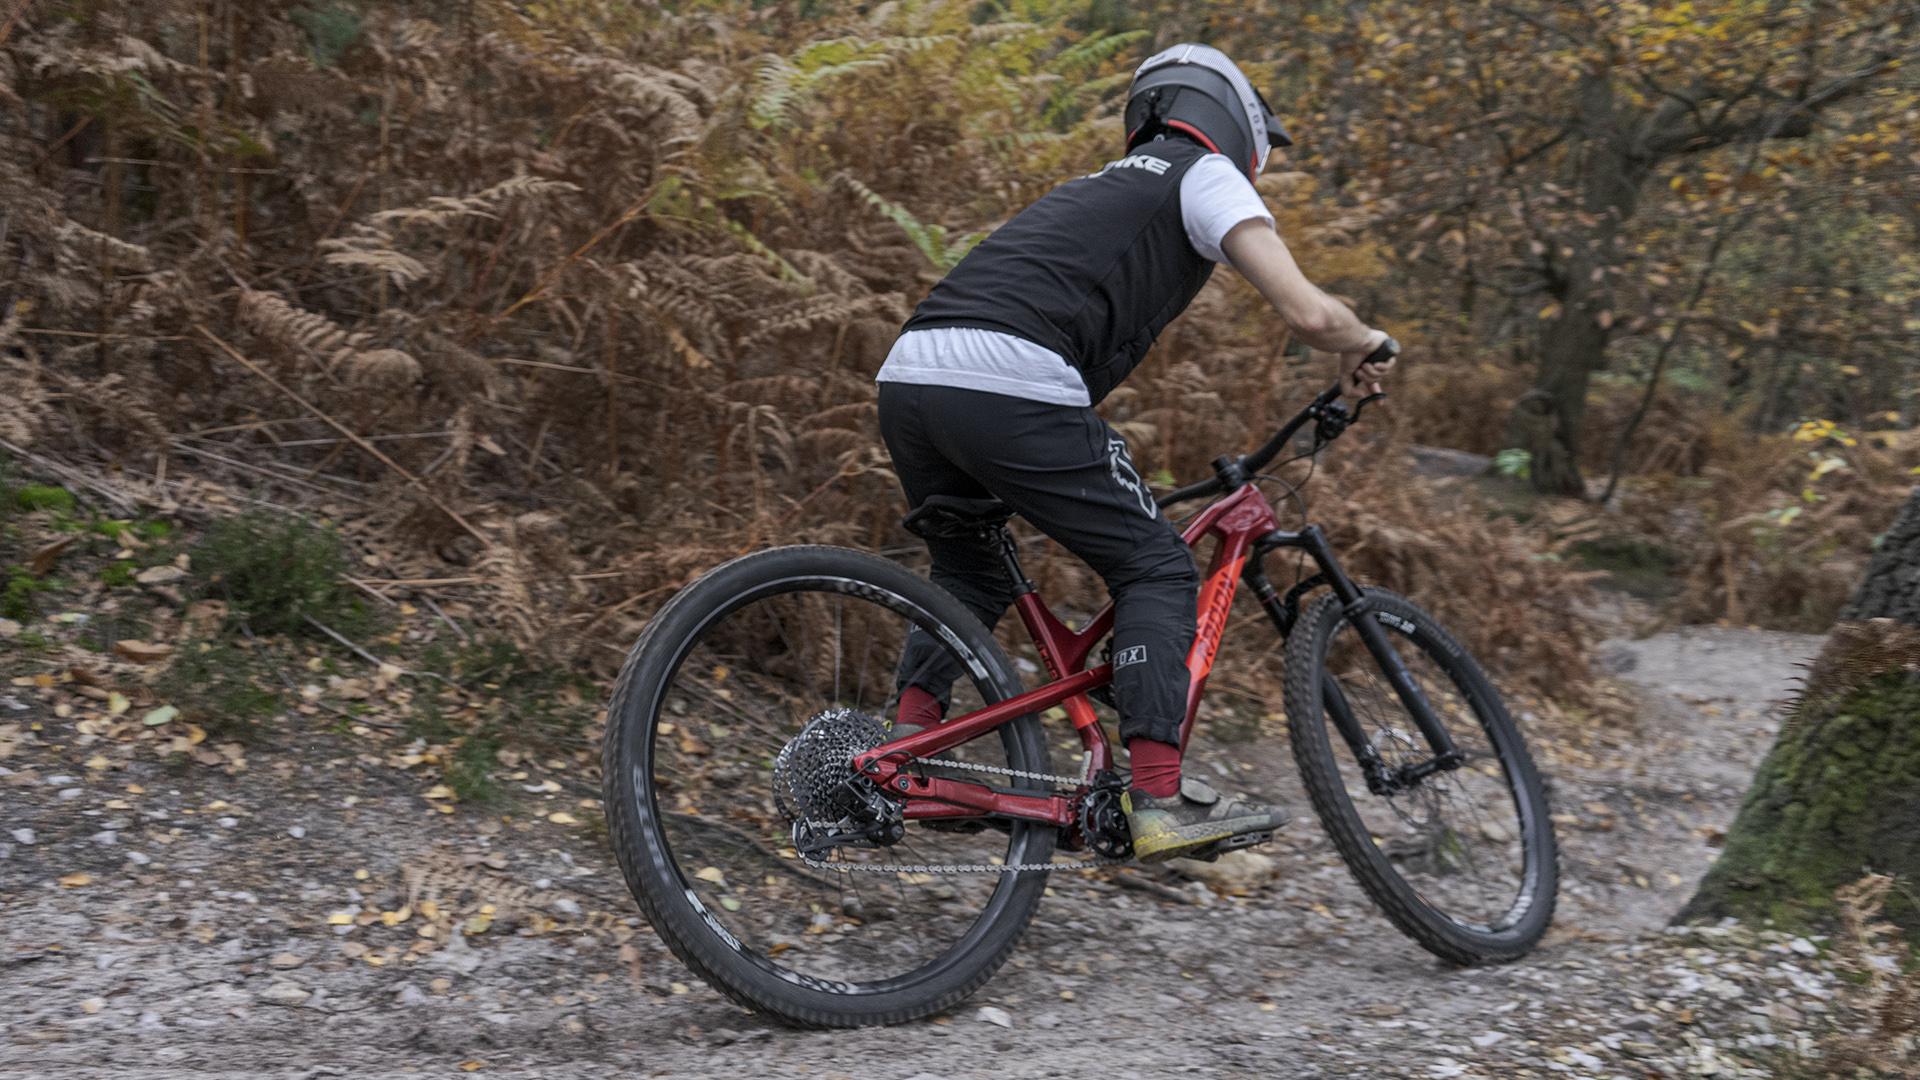 Radon Swoop Riding